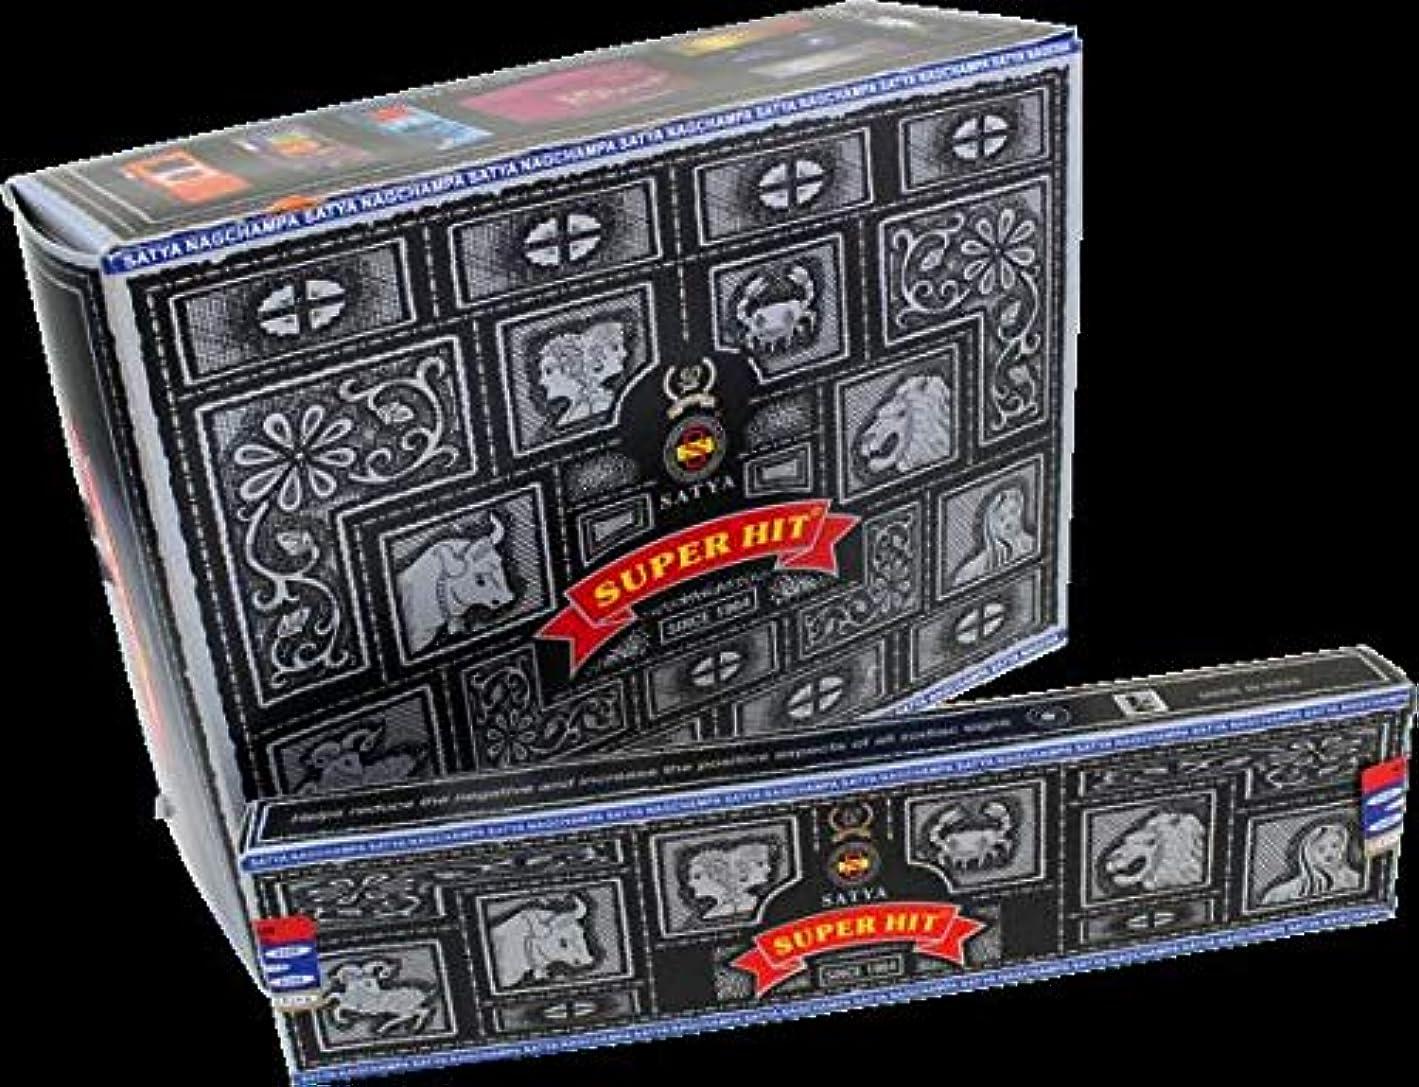 incense-superヒット40グラム